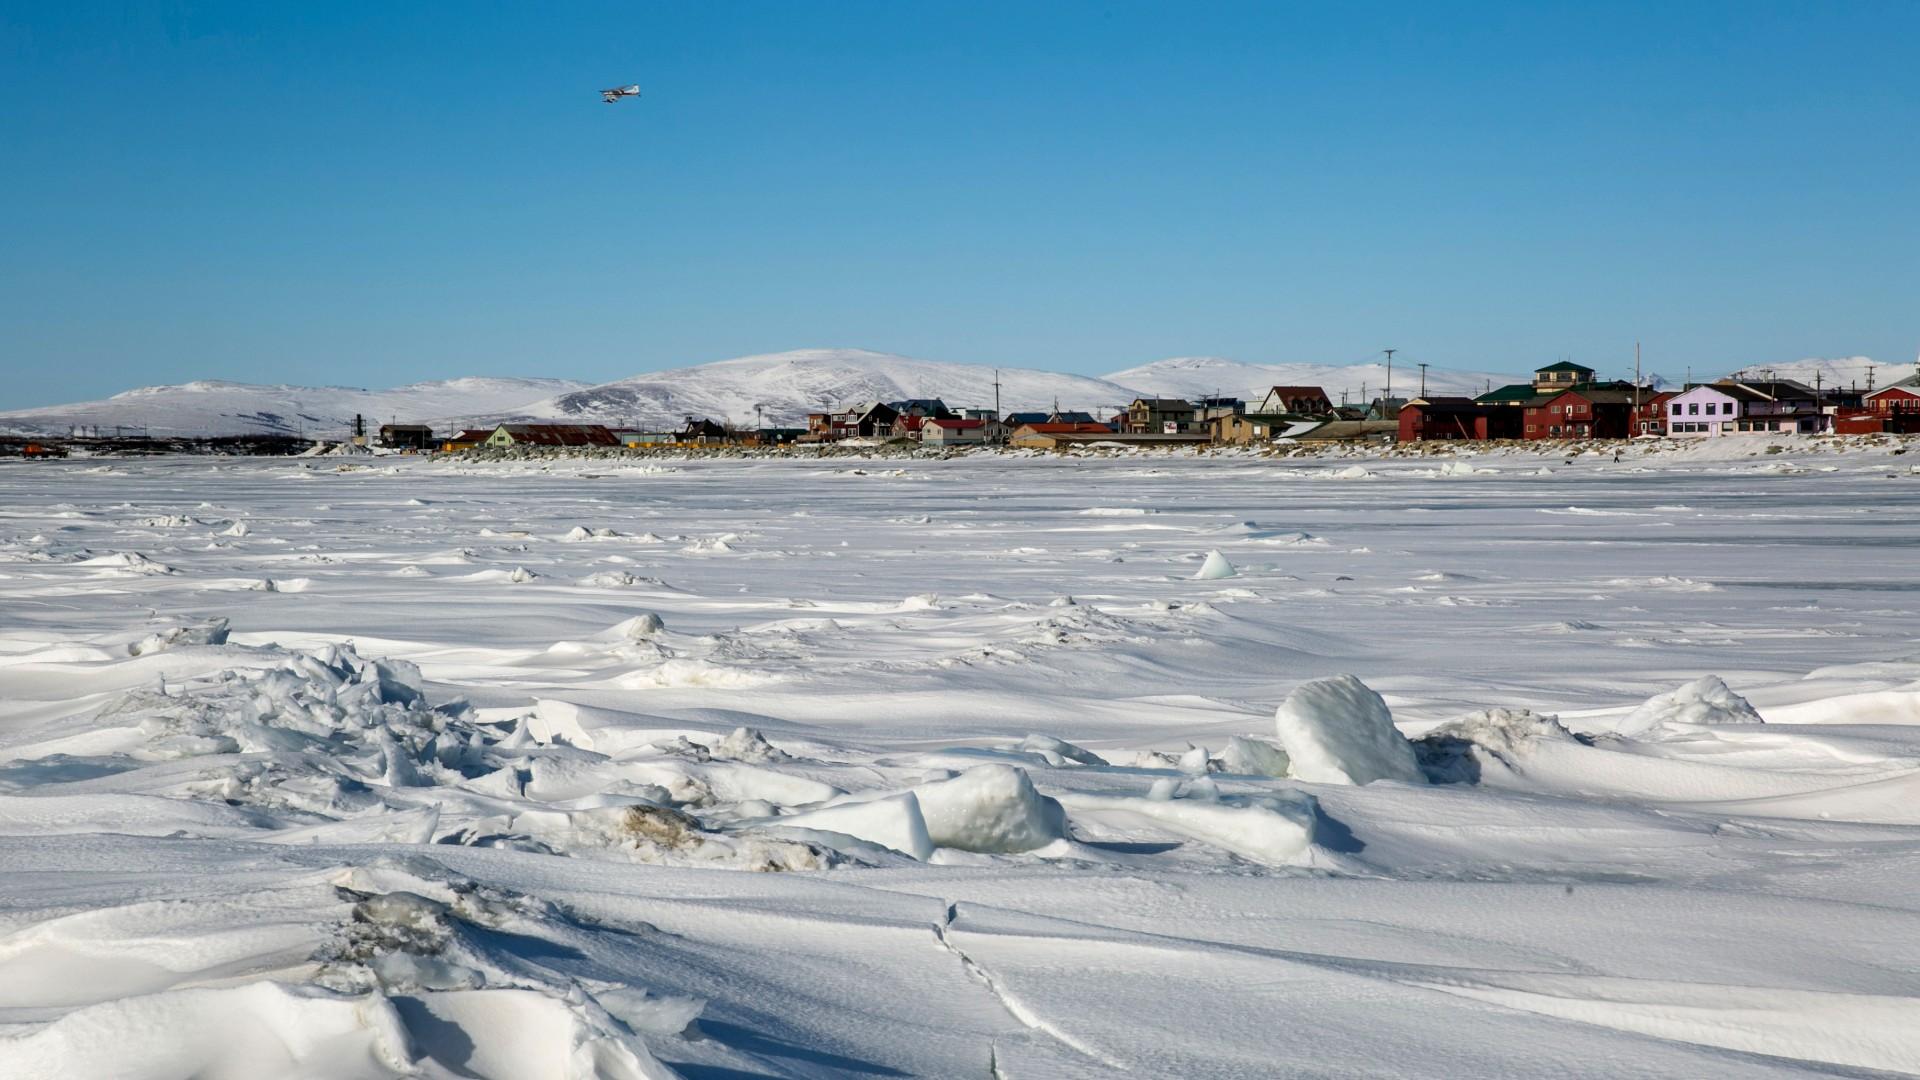 Luxury cruise ship leaves Alaska toward Northern Sea Route